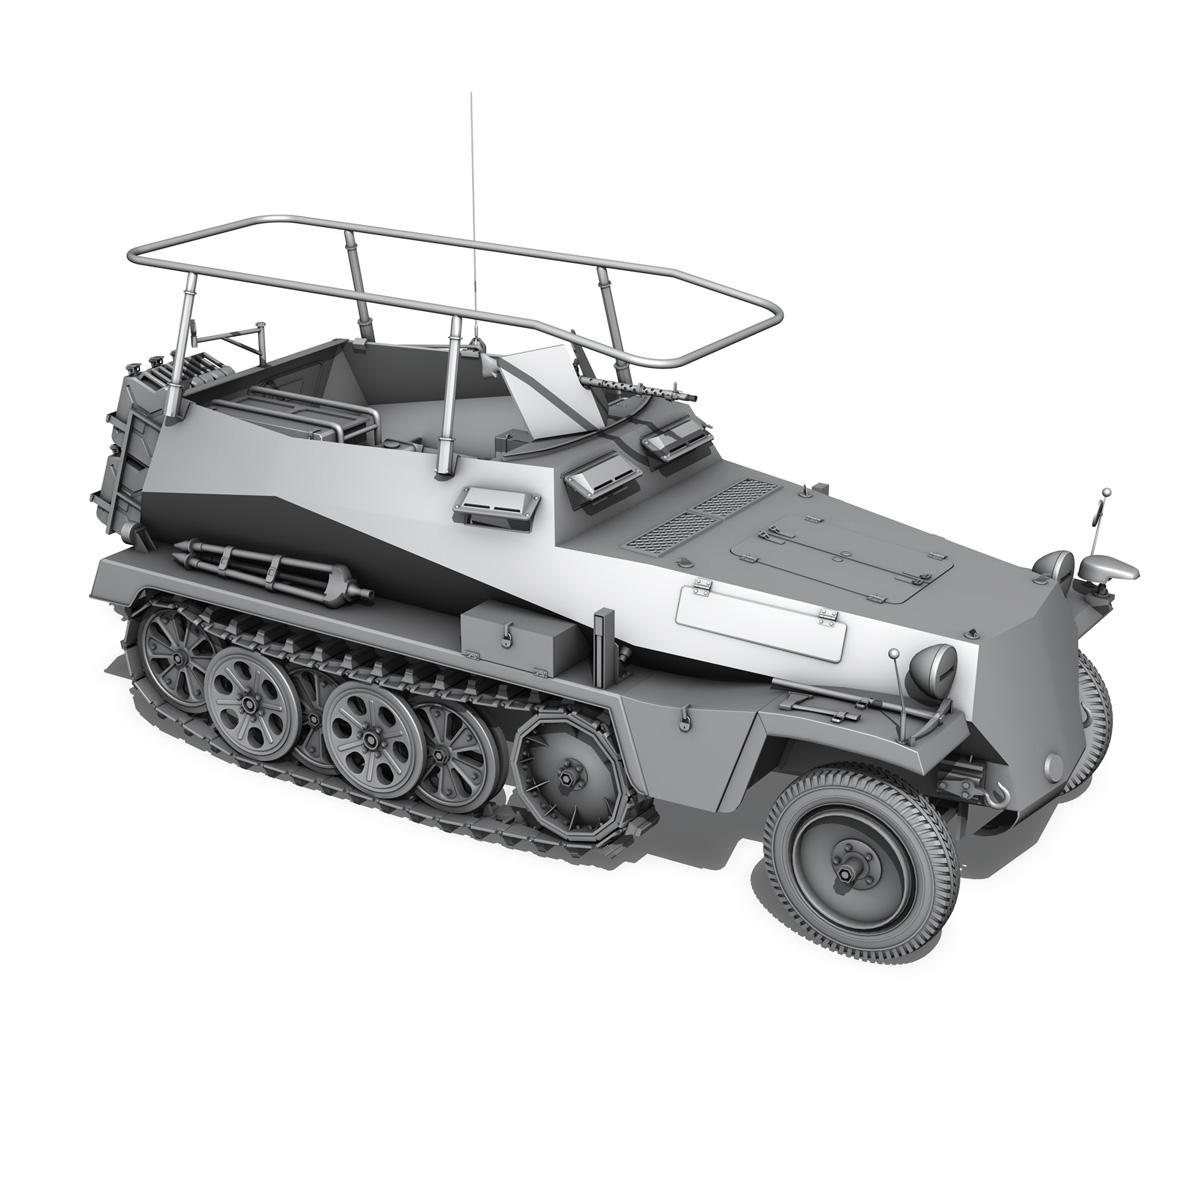 sdkfz 250 – command halftrack 3d model 3ds fbx c4d lwo obj 251674